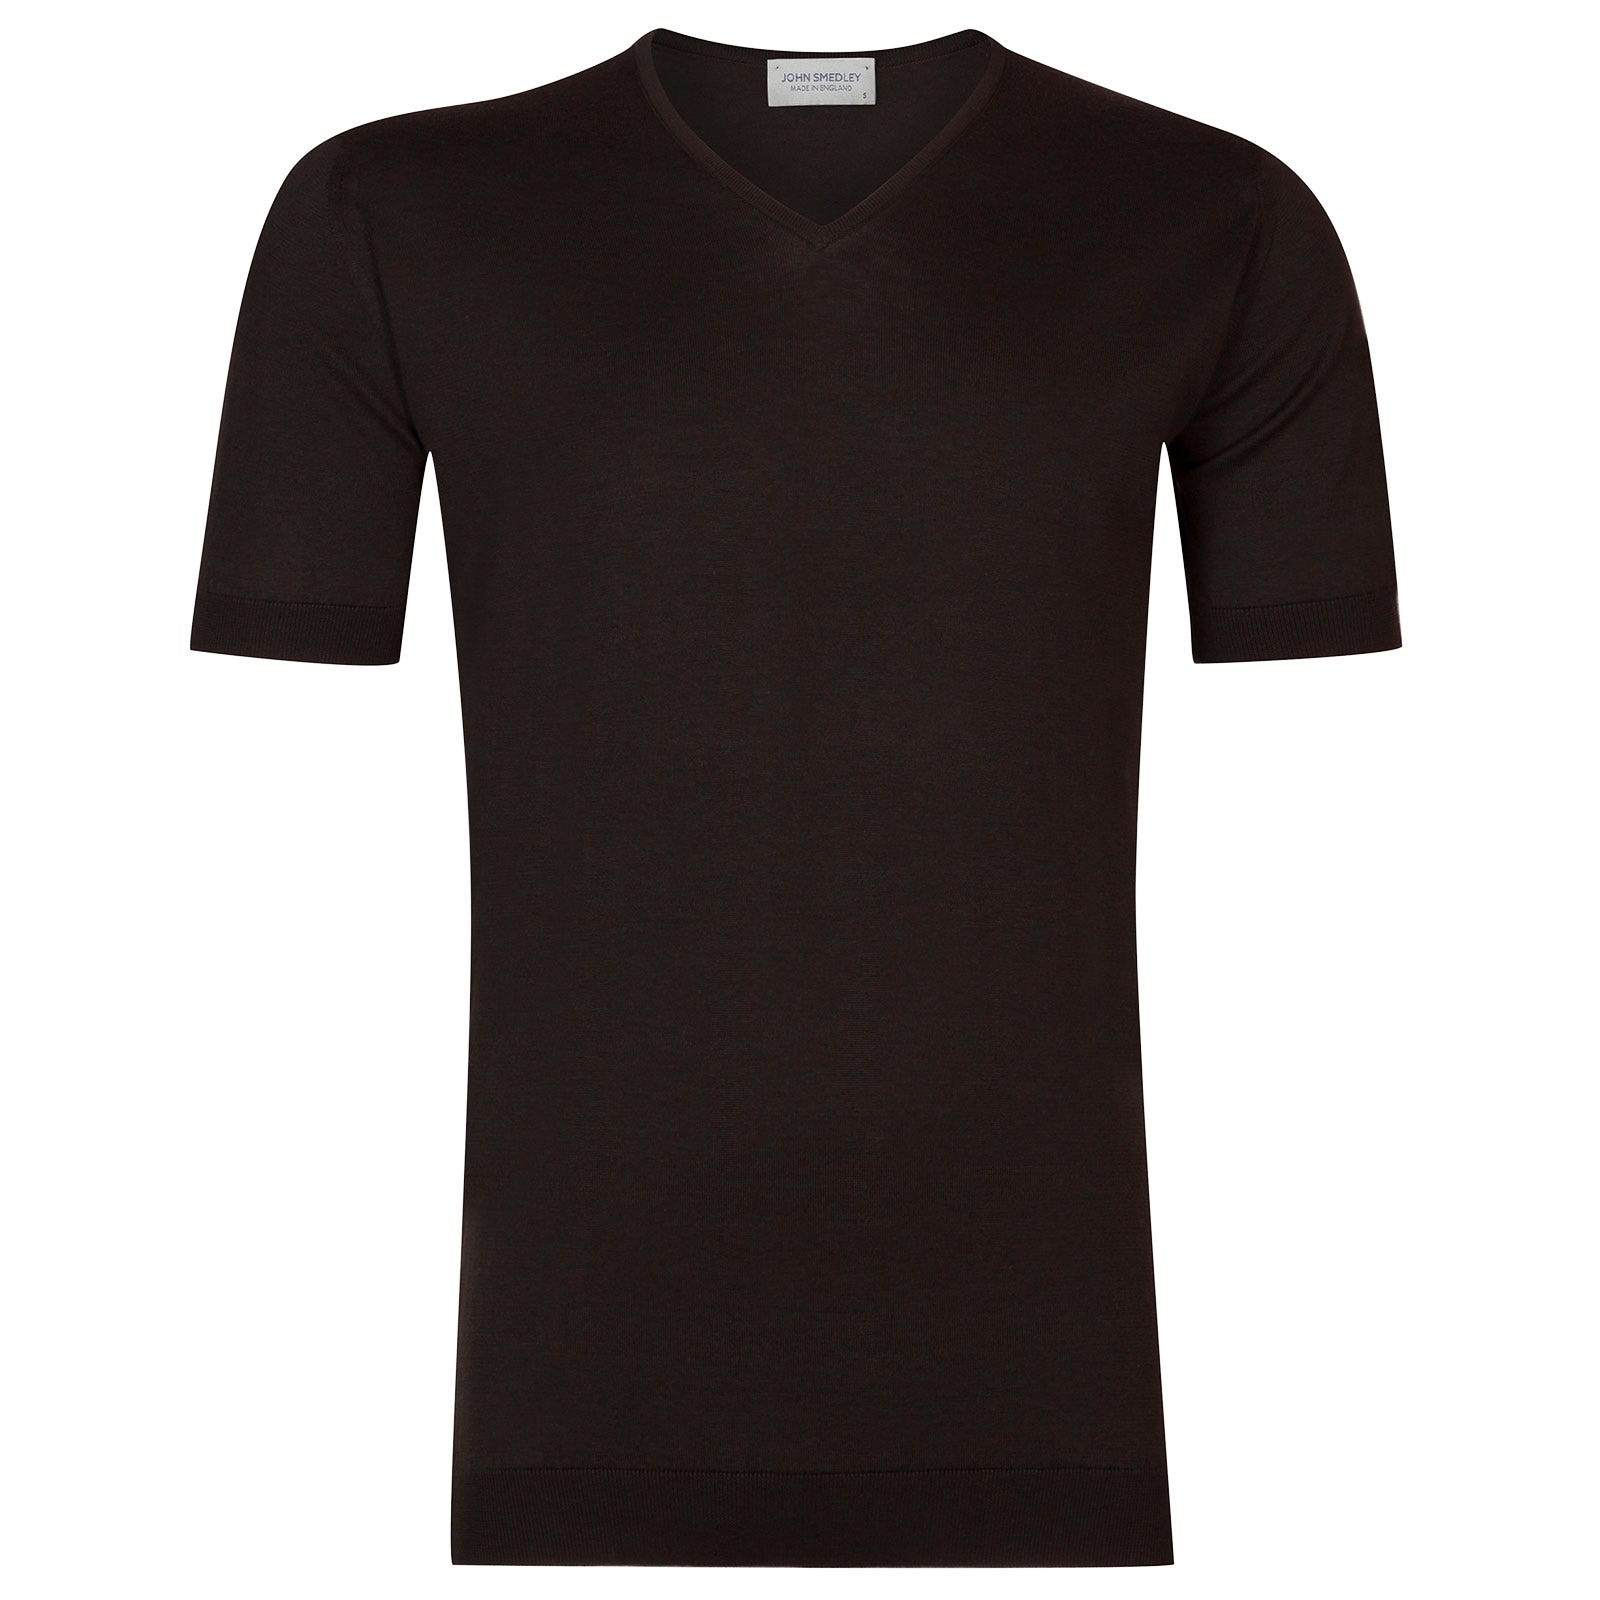 John Smedley Braedon Sea Island Cotton T-shirt in Dark Leather-M